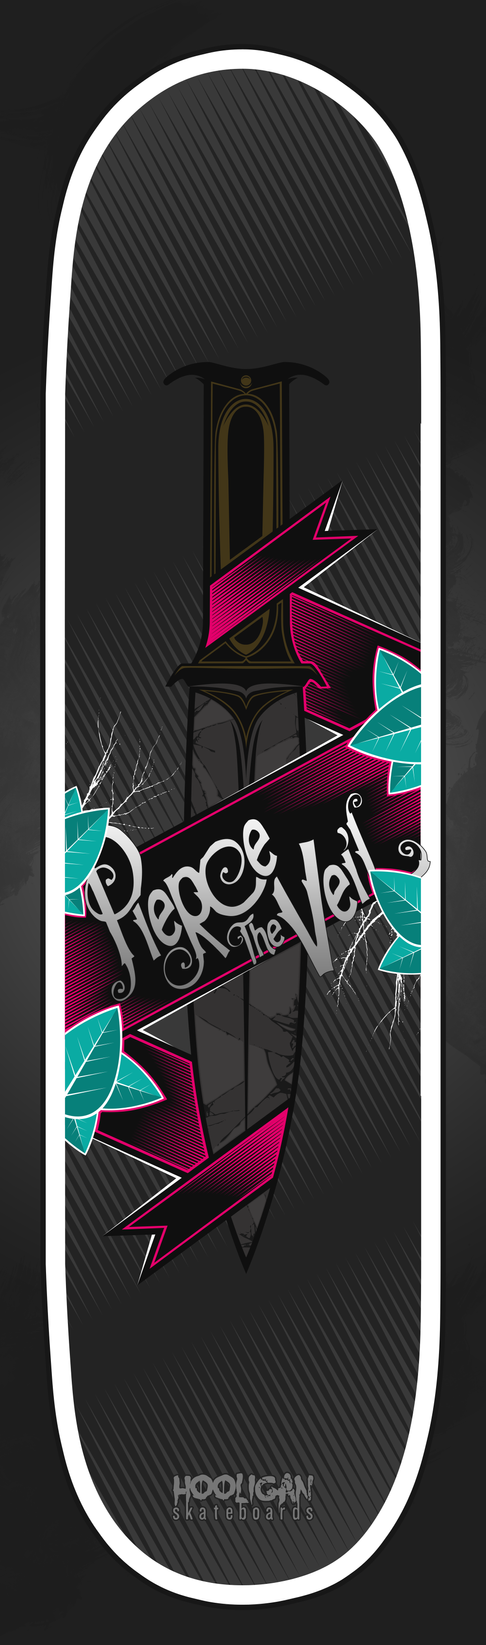 Pierce the Veil Sk8Board by B-boyAlfelor